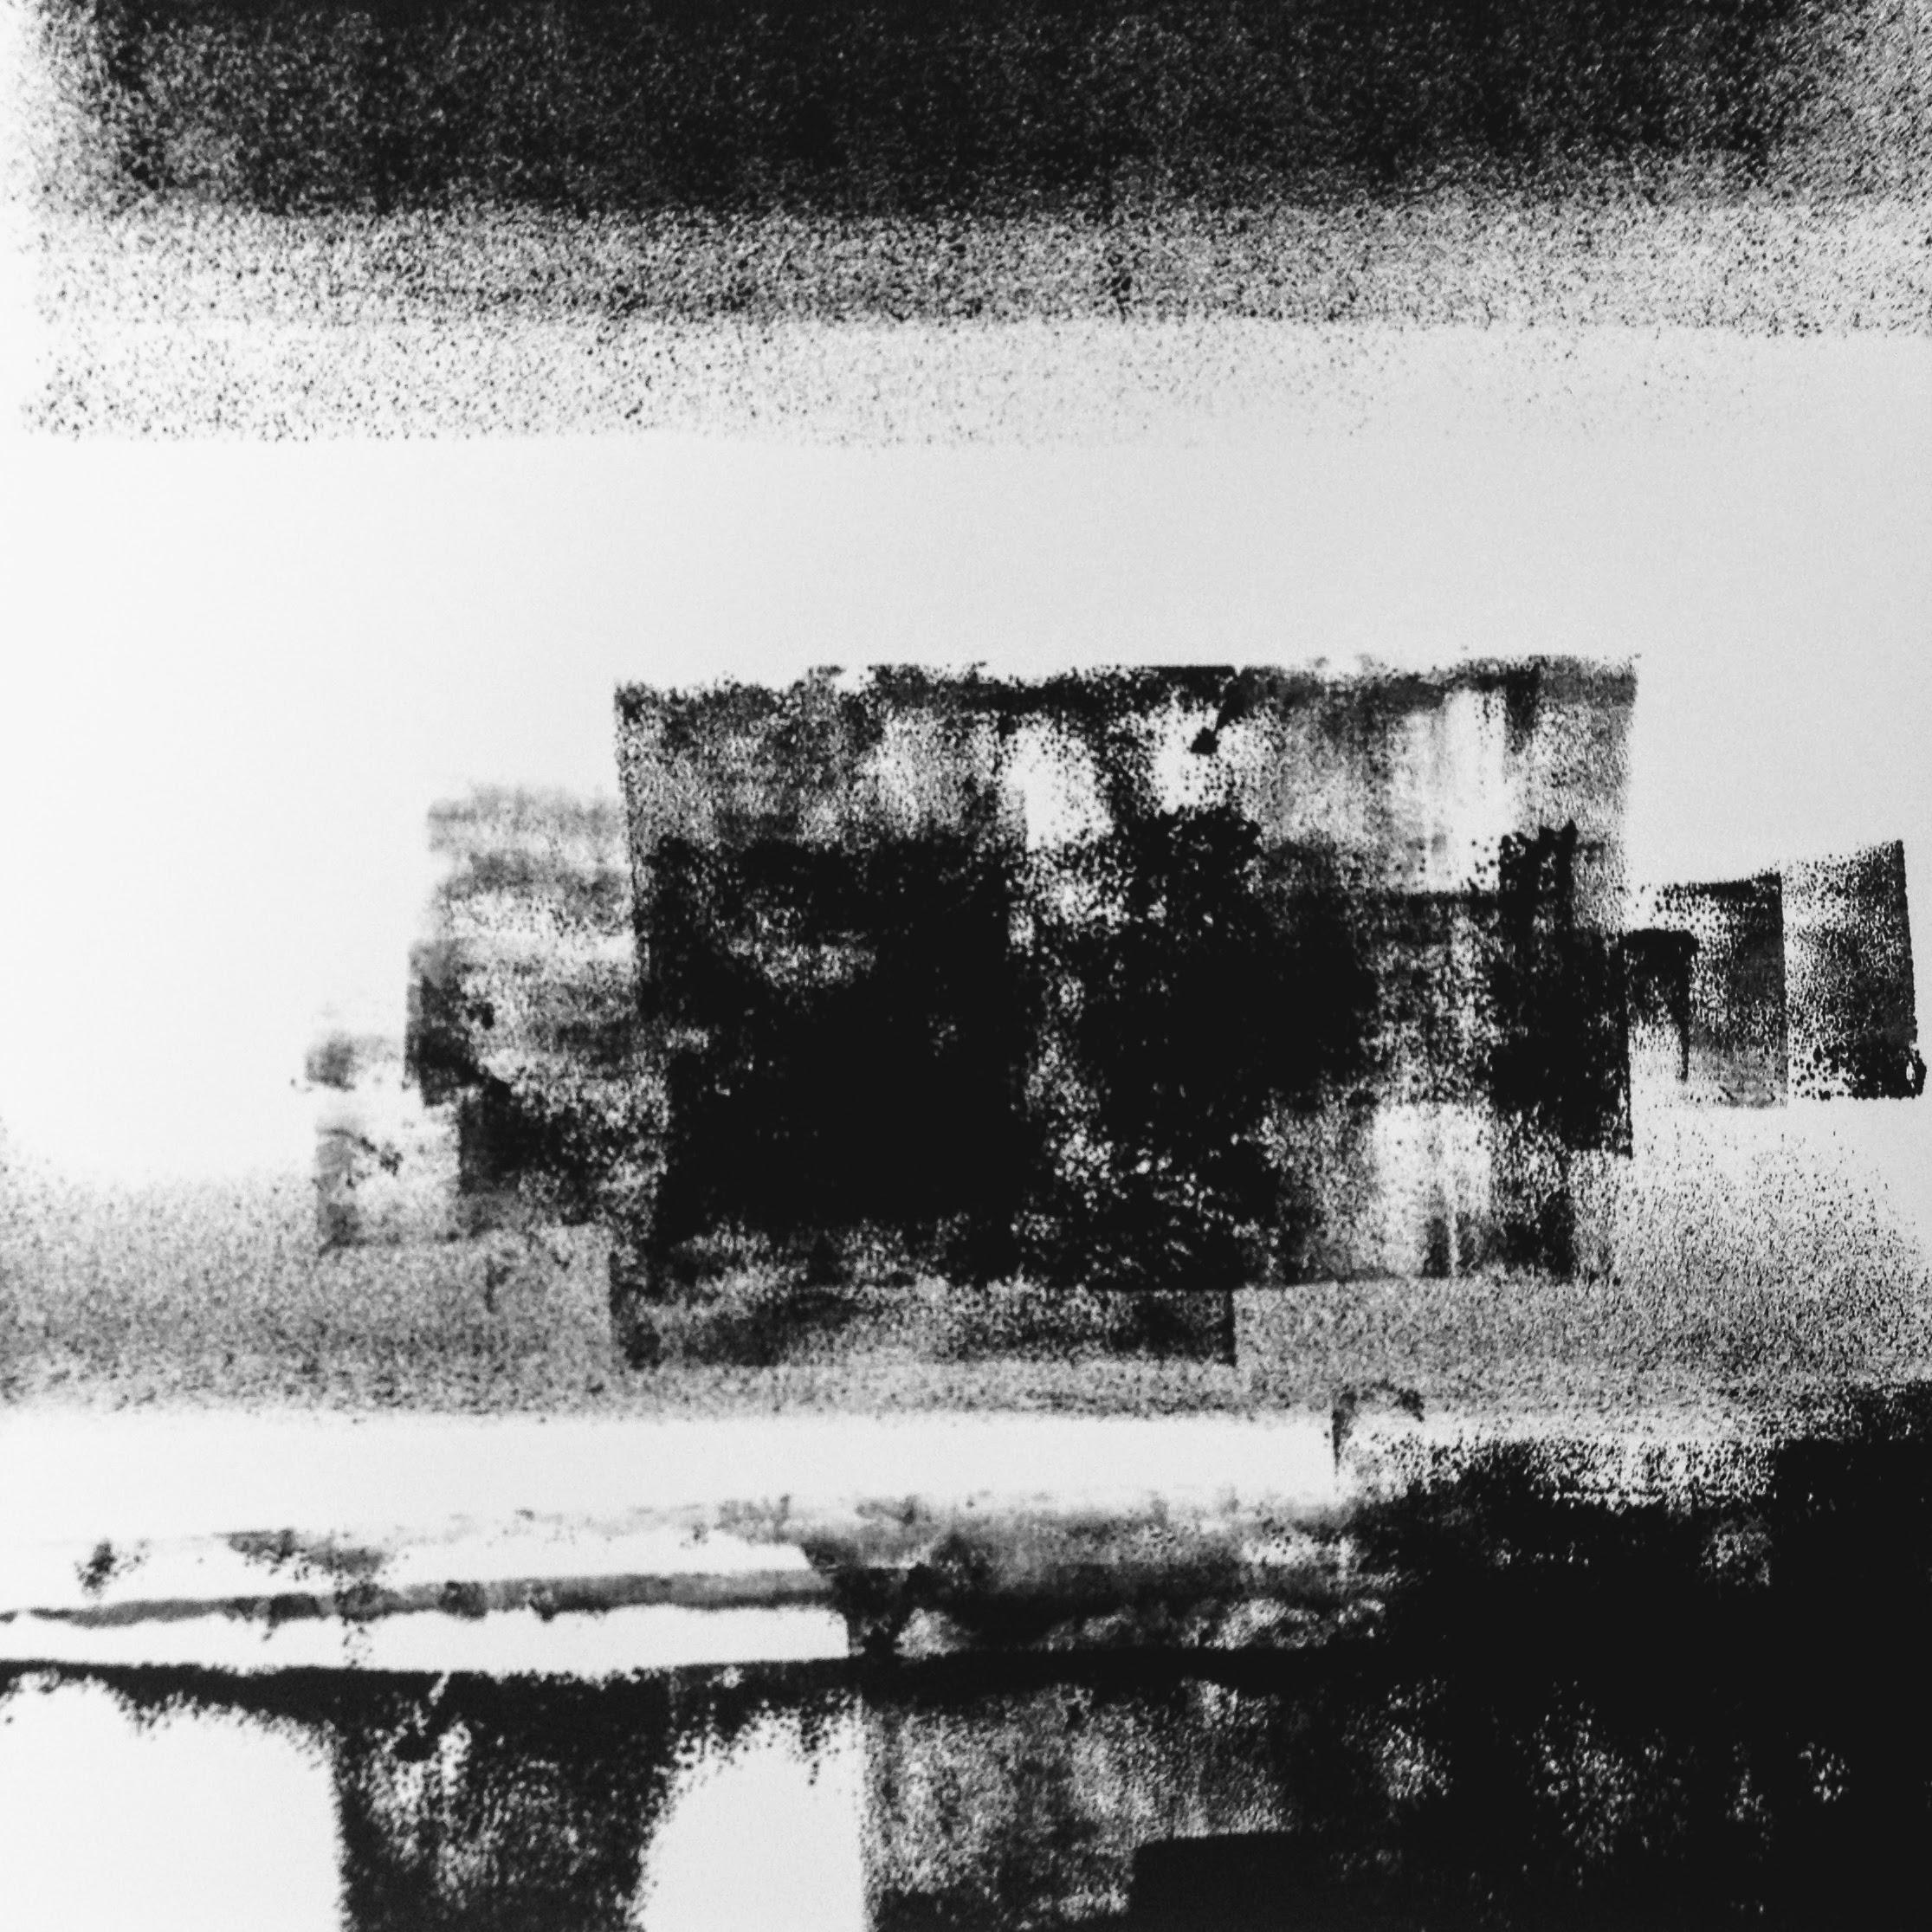 Dark Skies V, monotype, 2017, 300x300mm, 250gm Somerset Satin